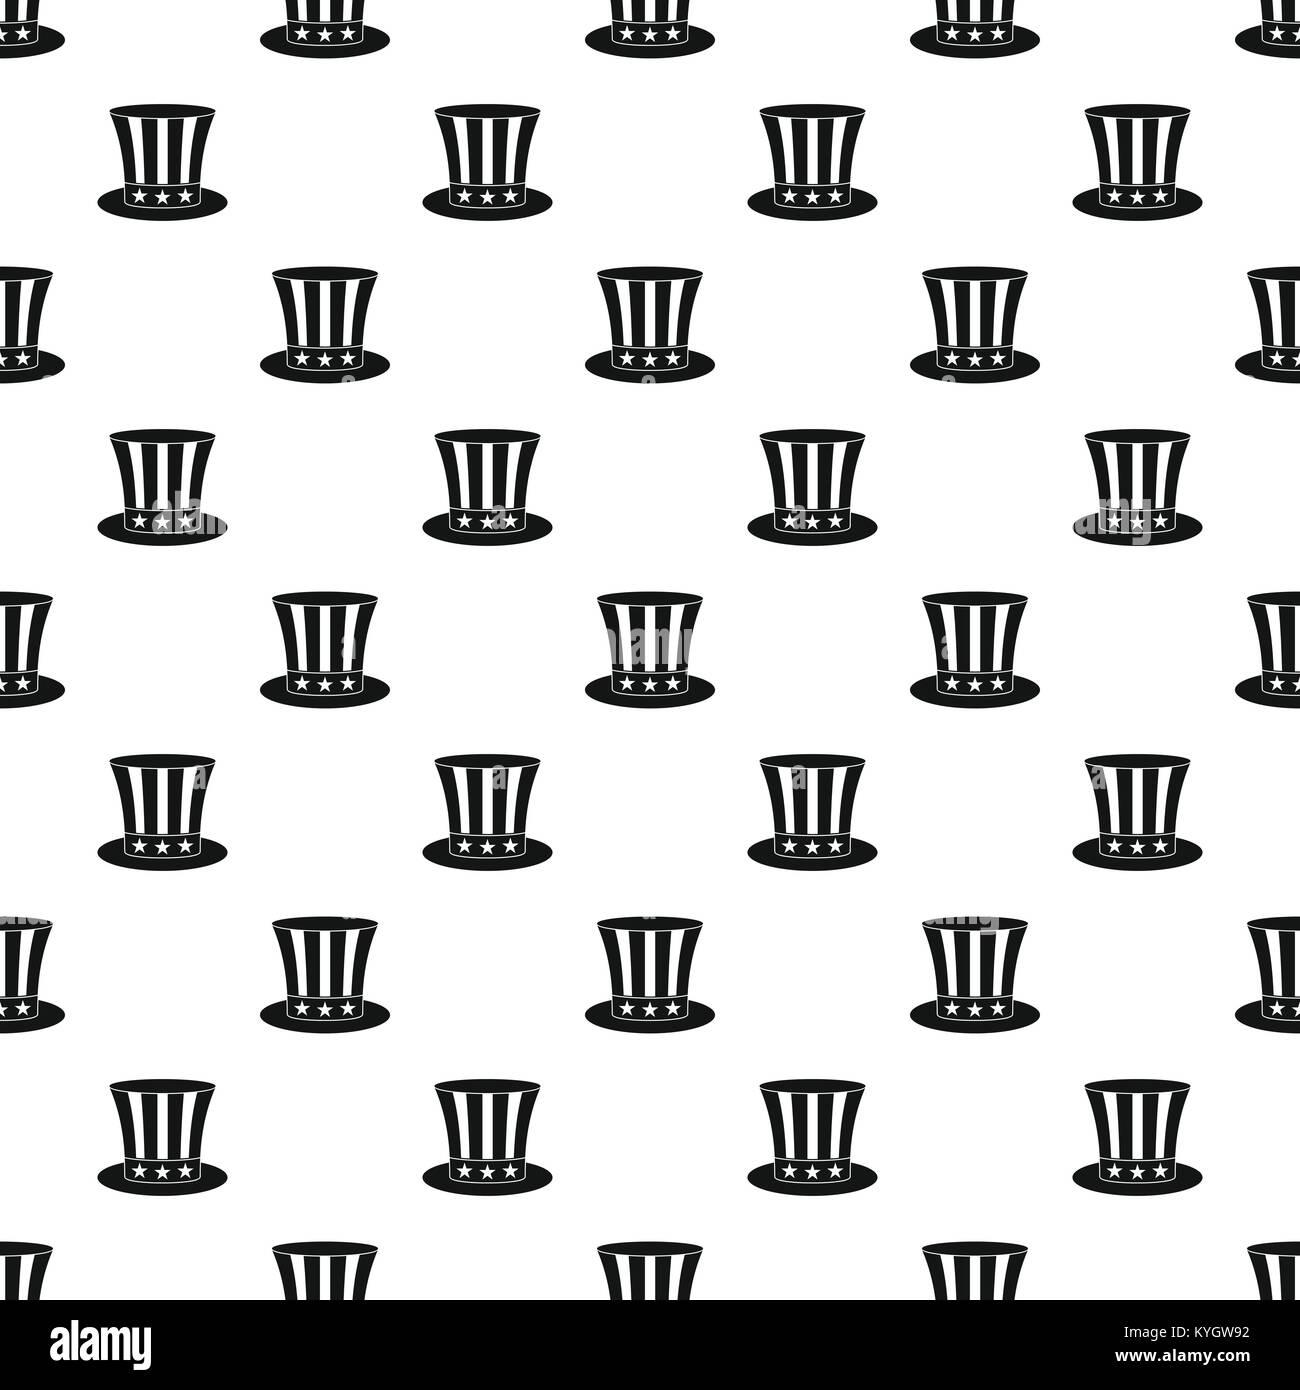 uncle sam hat pattern vector stock vector art illustration vector